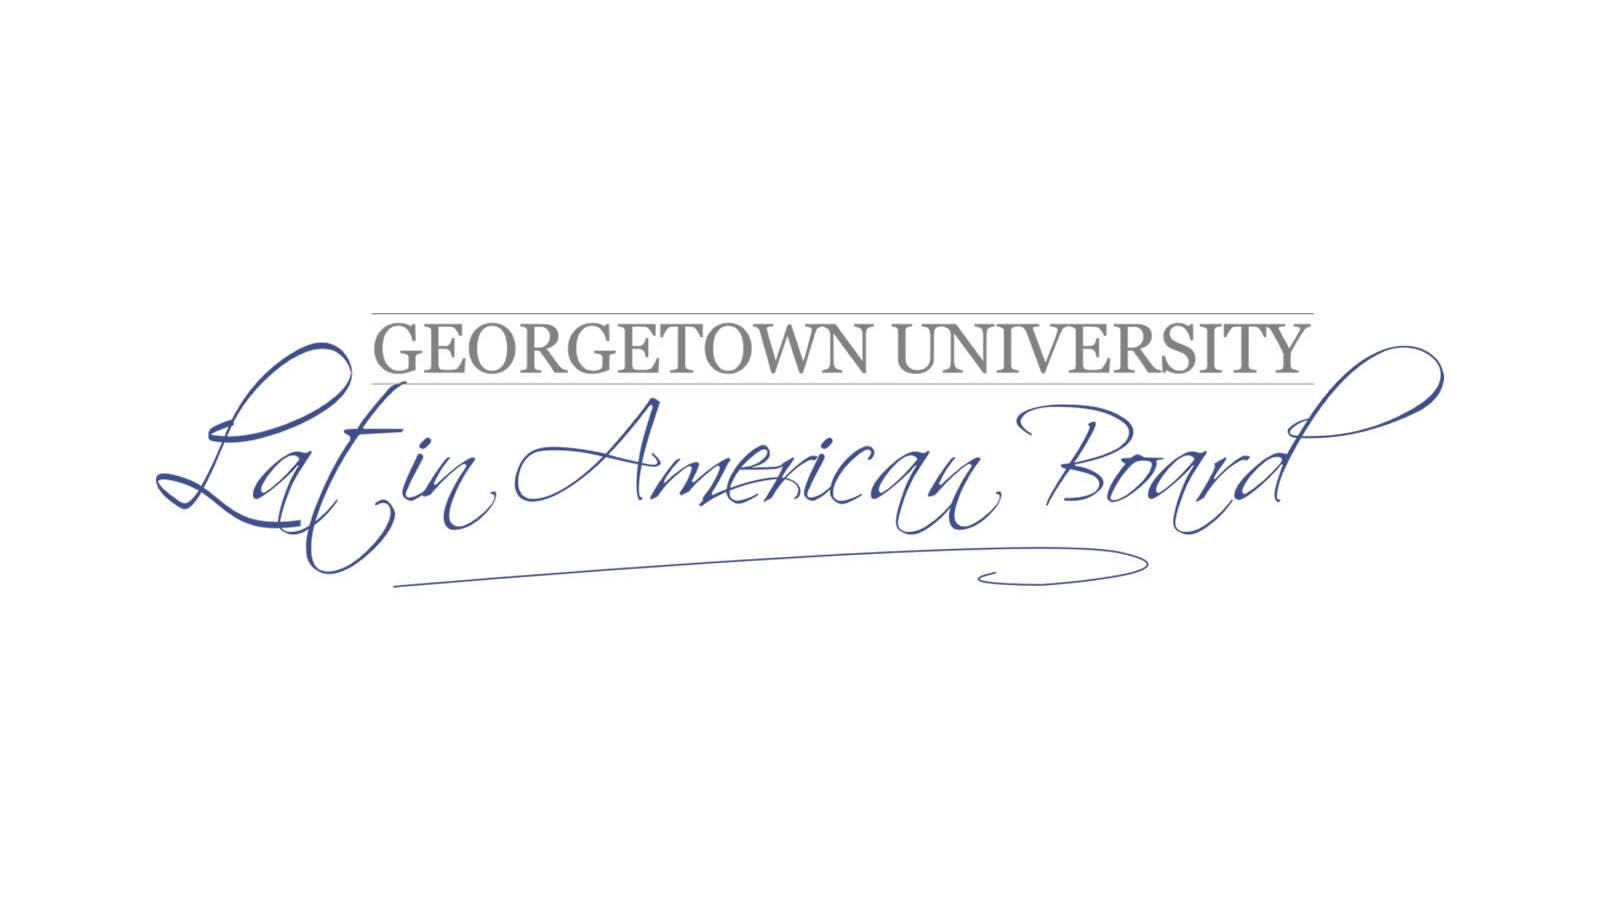 Georgetown University Latin America Board Logo